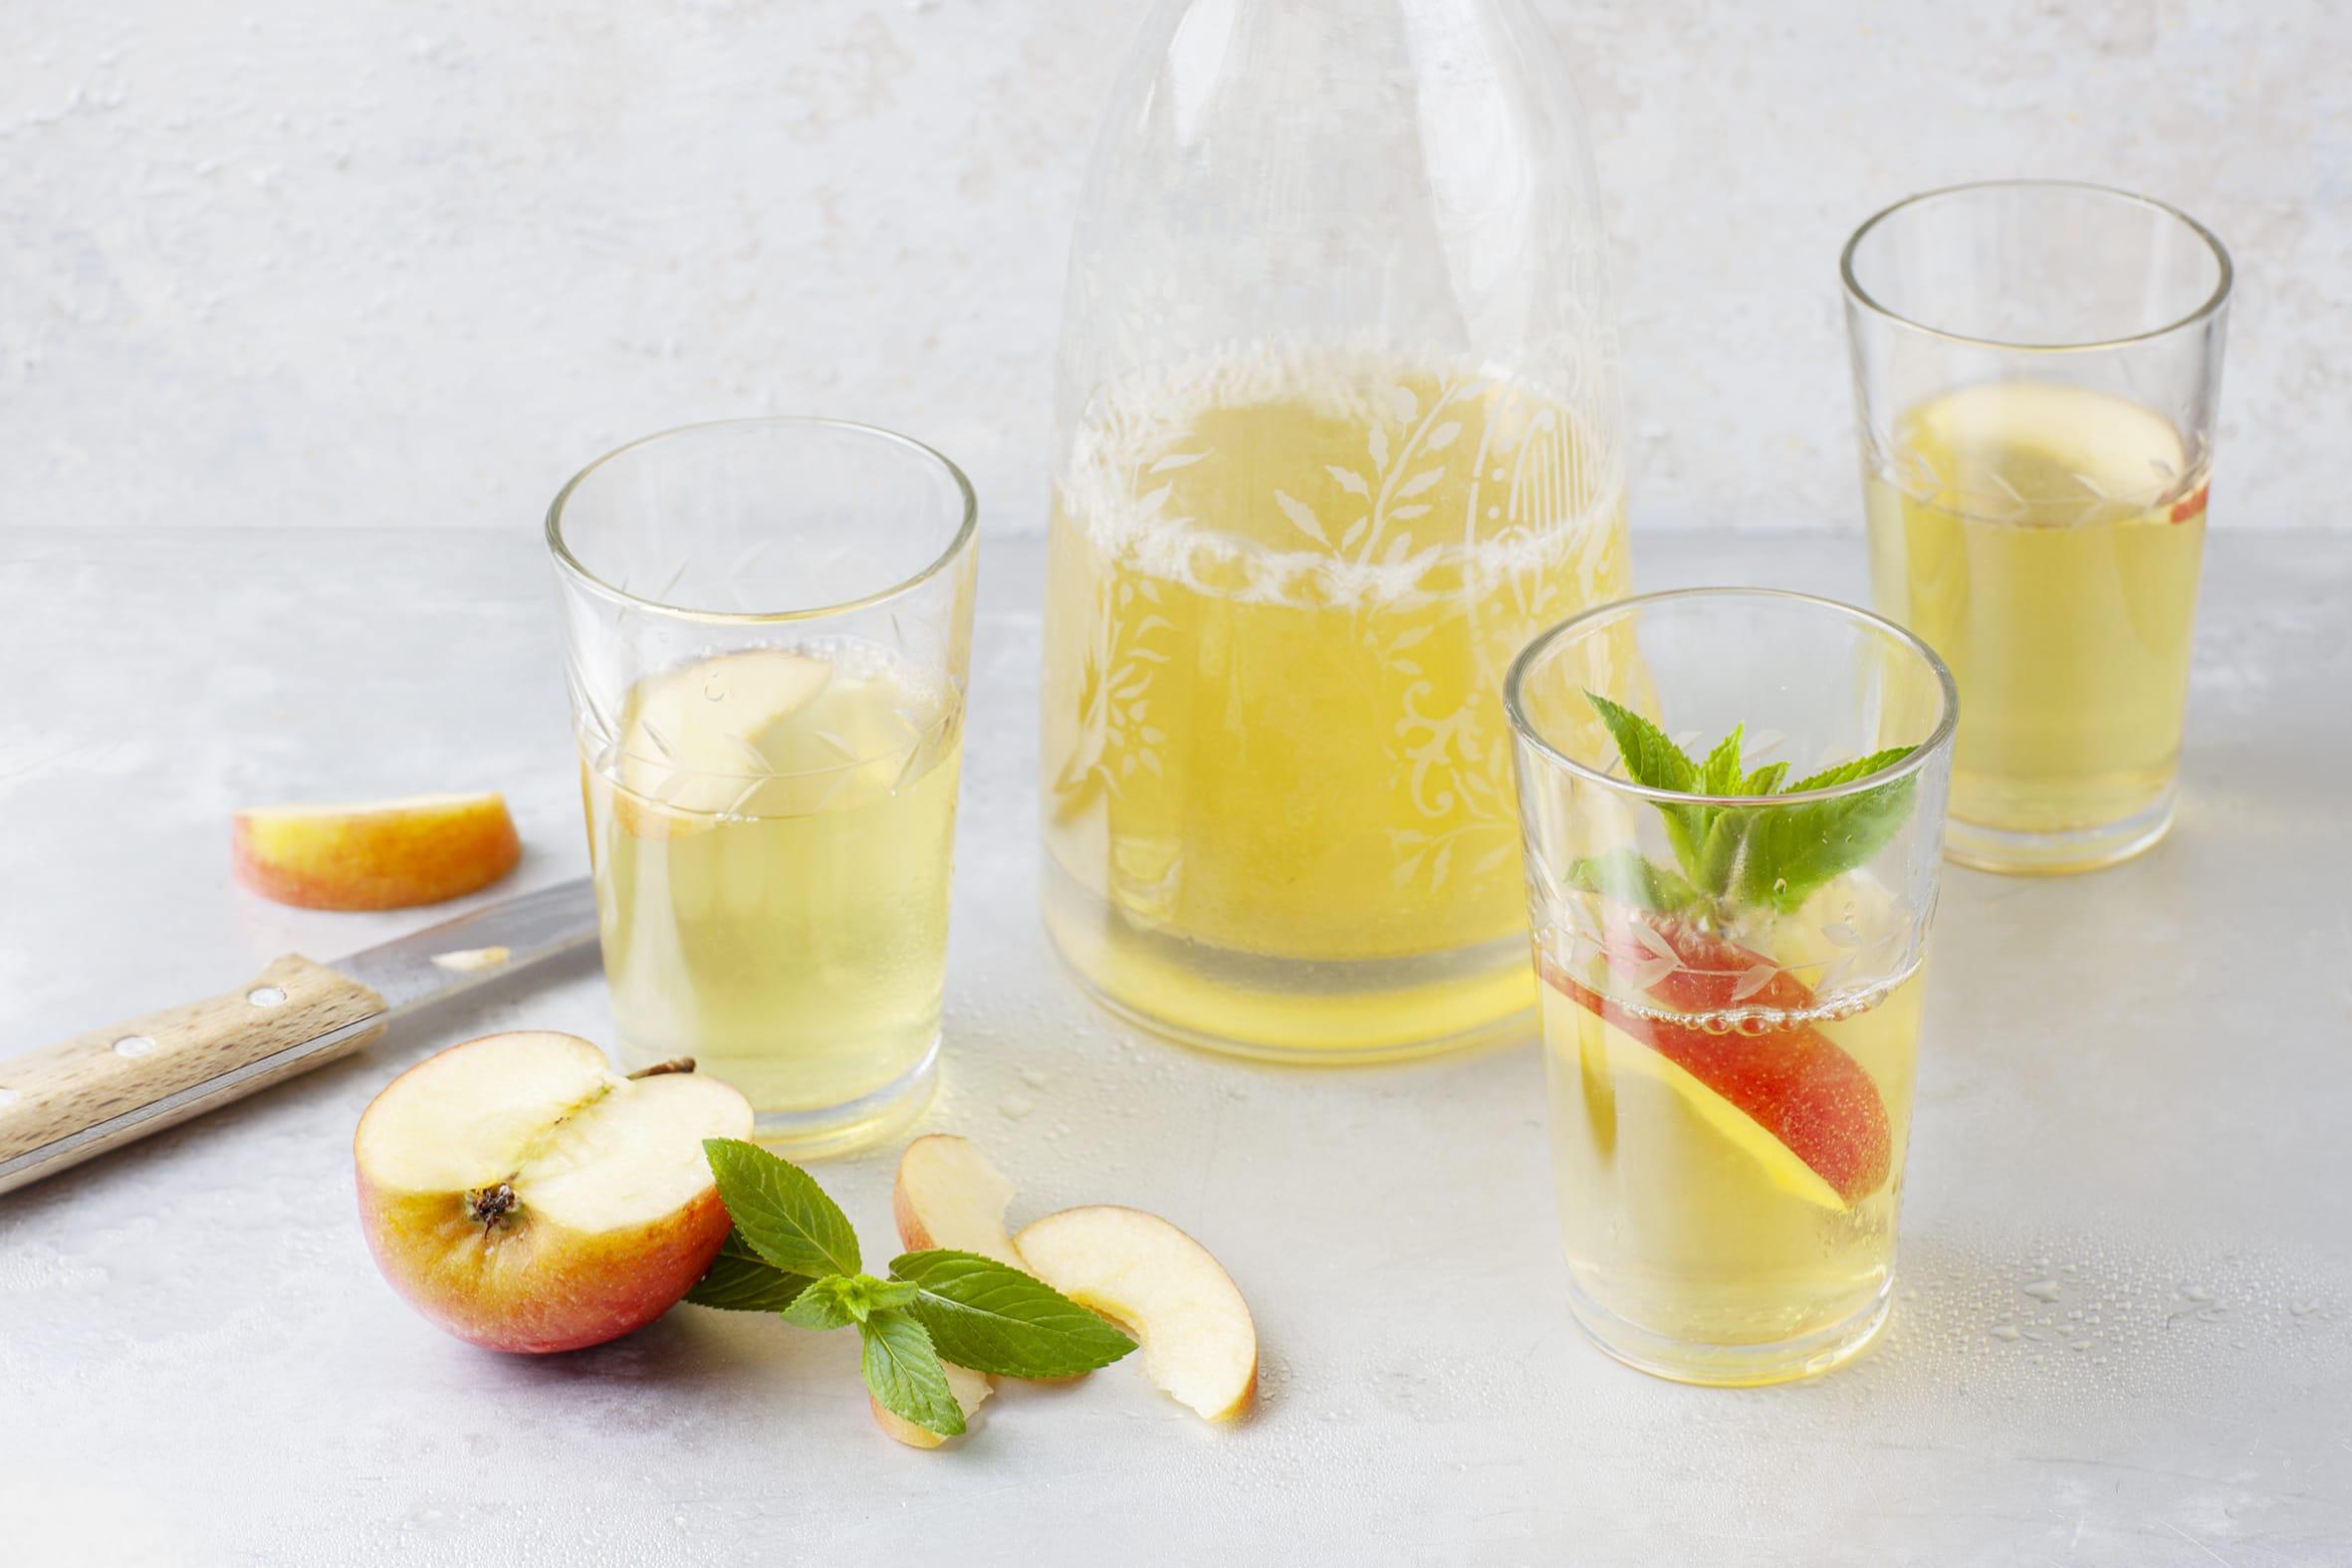 Gespritztes Apfel-Minze-Getränk